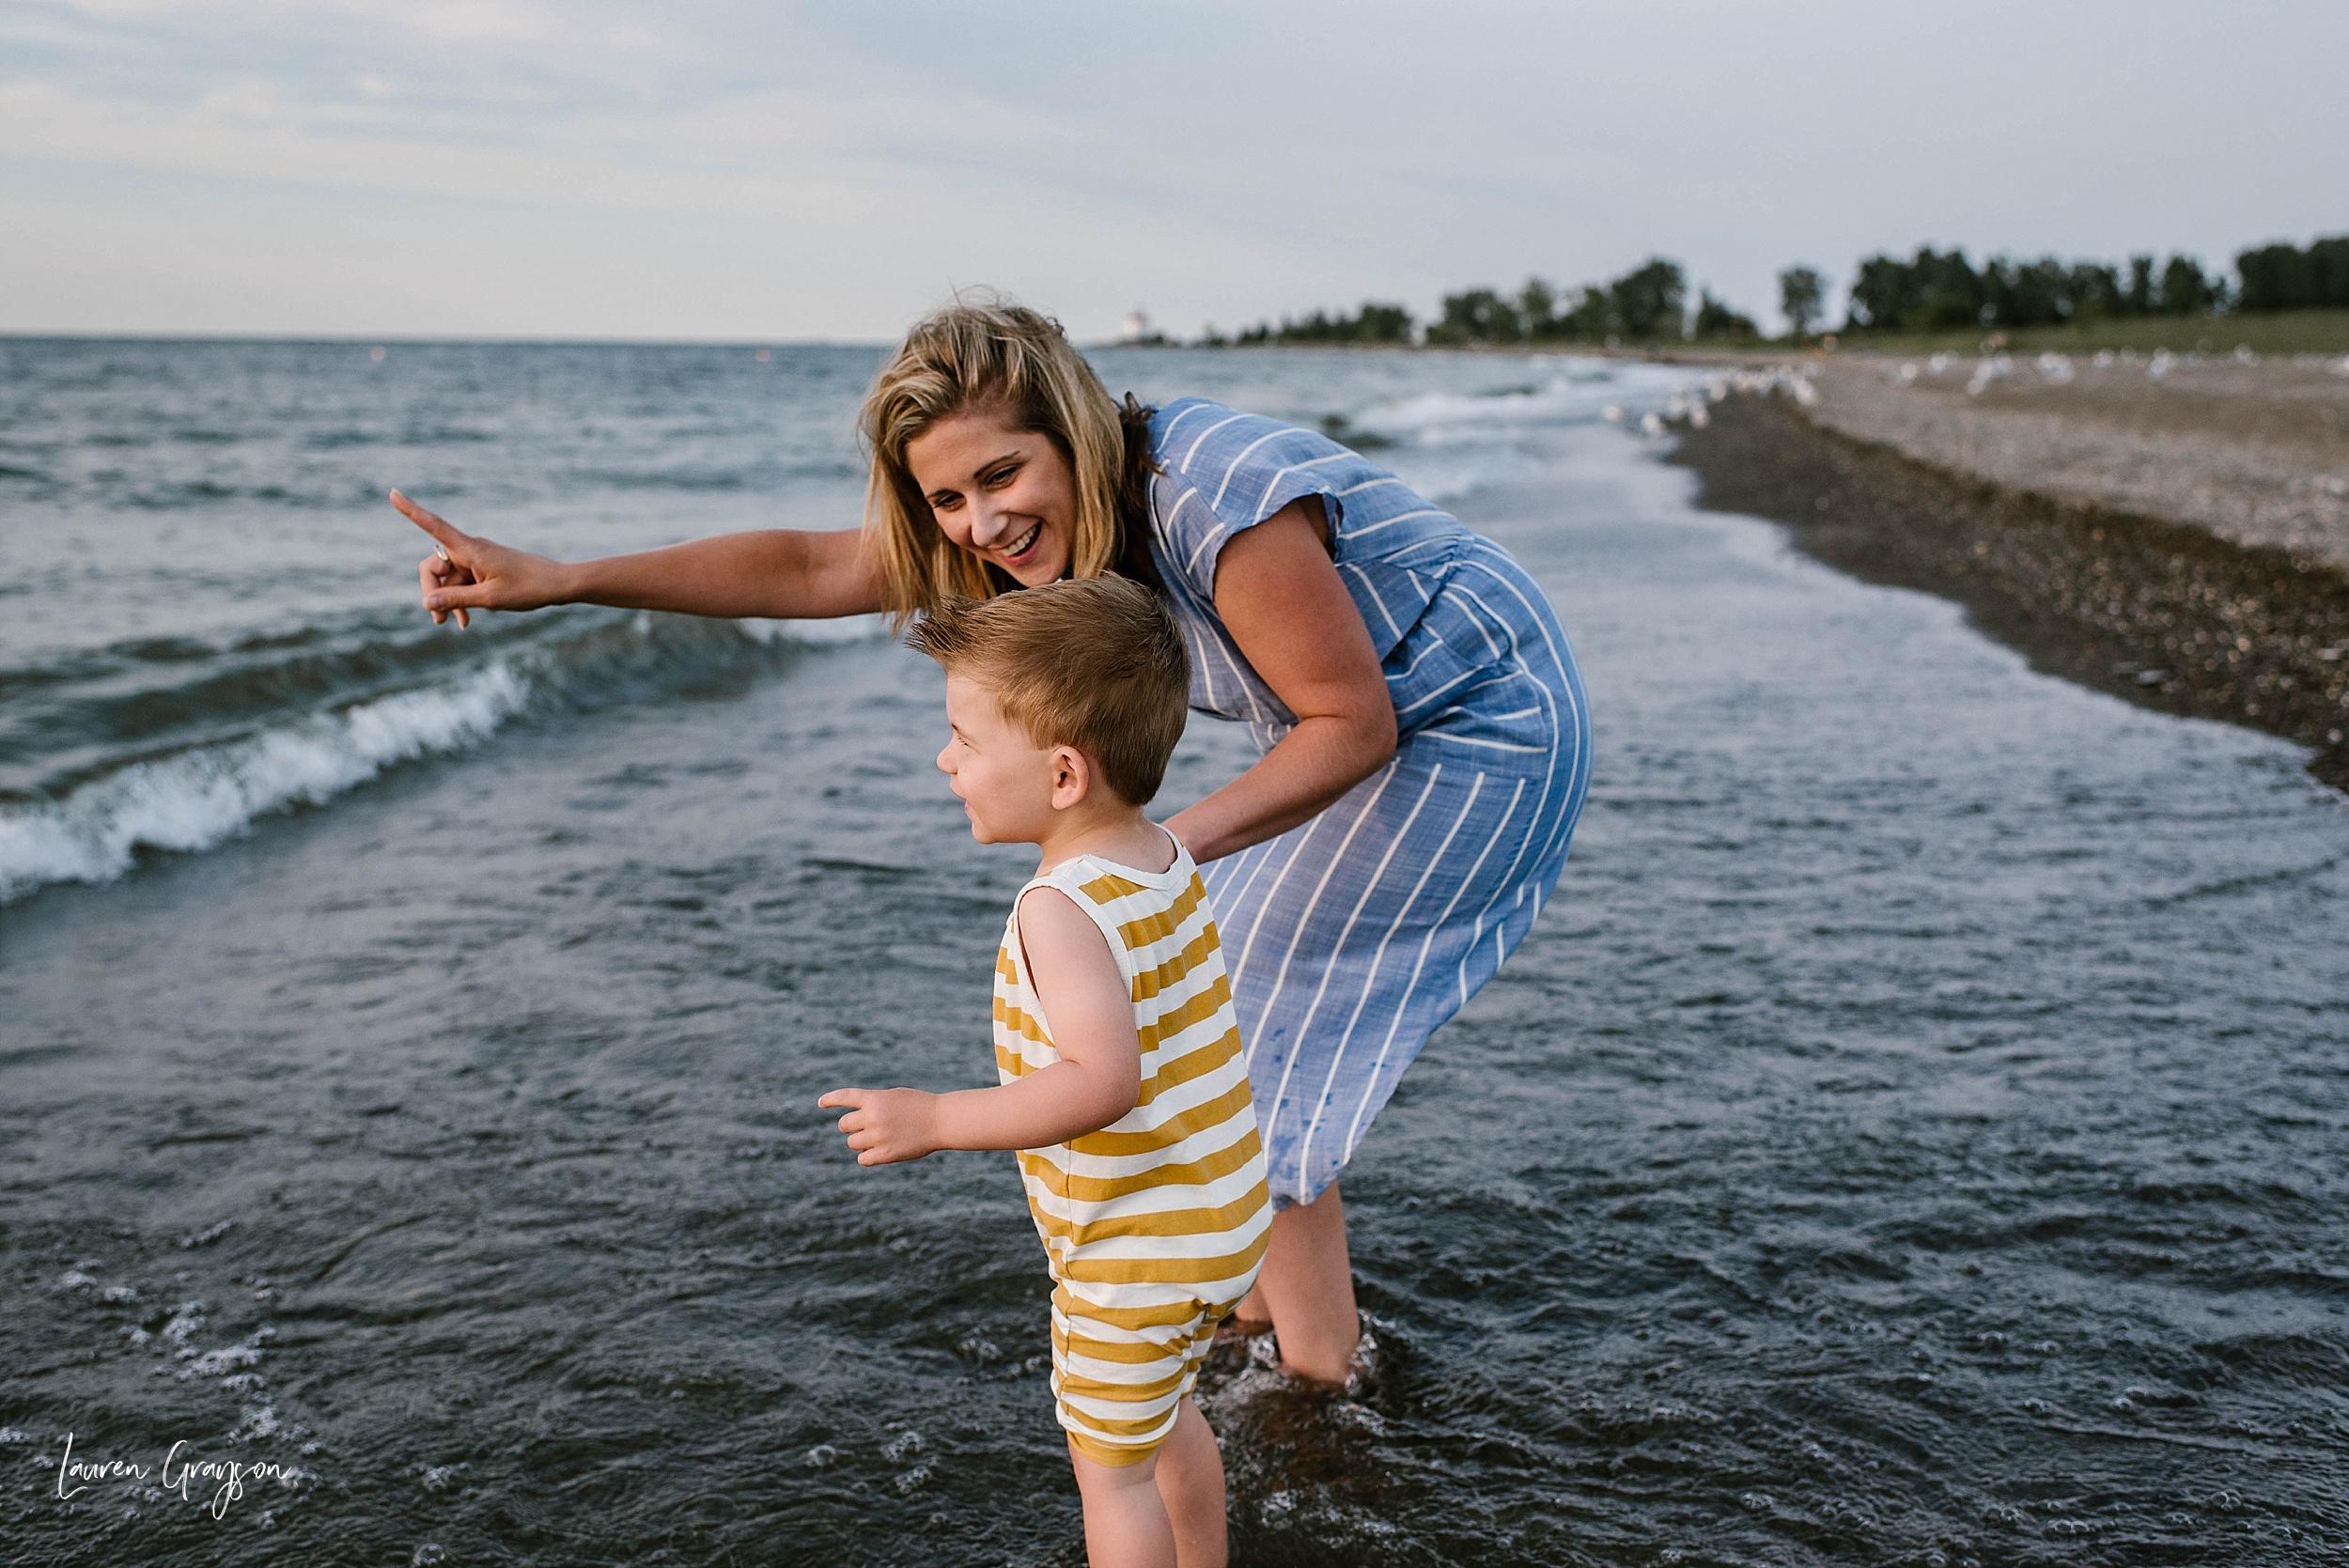 lauren-grayson-photography-cleveland-ohio-photographer-mentor-headlands-beach-maternity-session-2018_0766.jpg